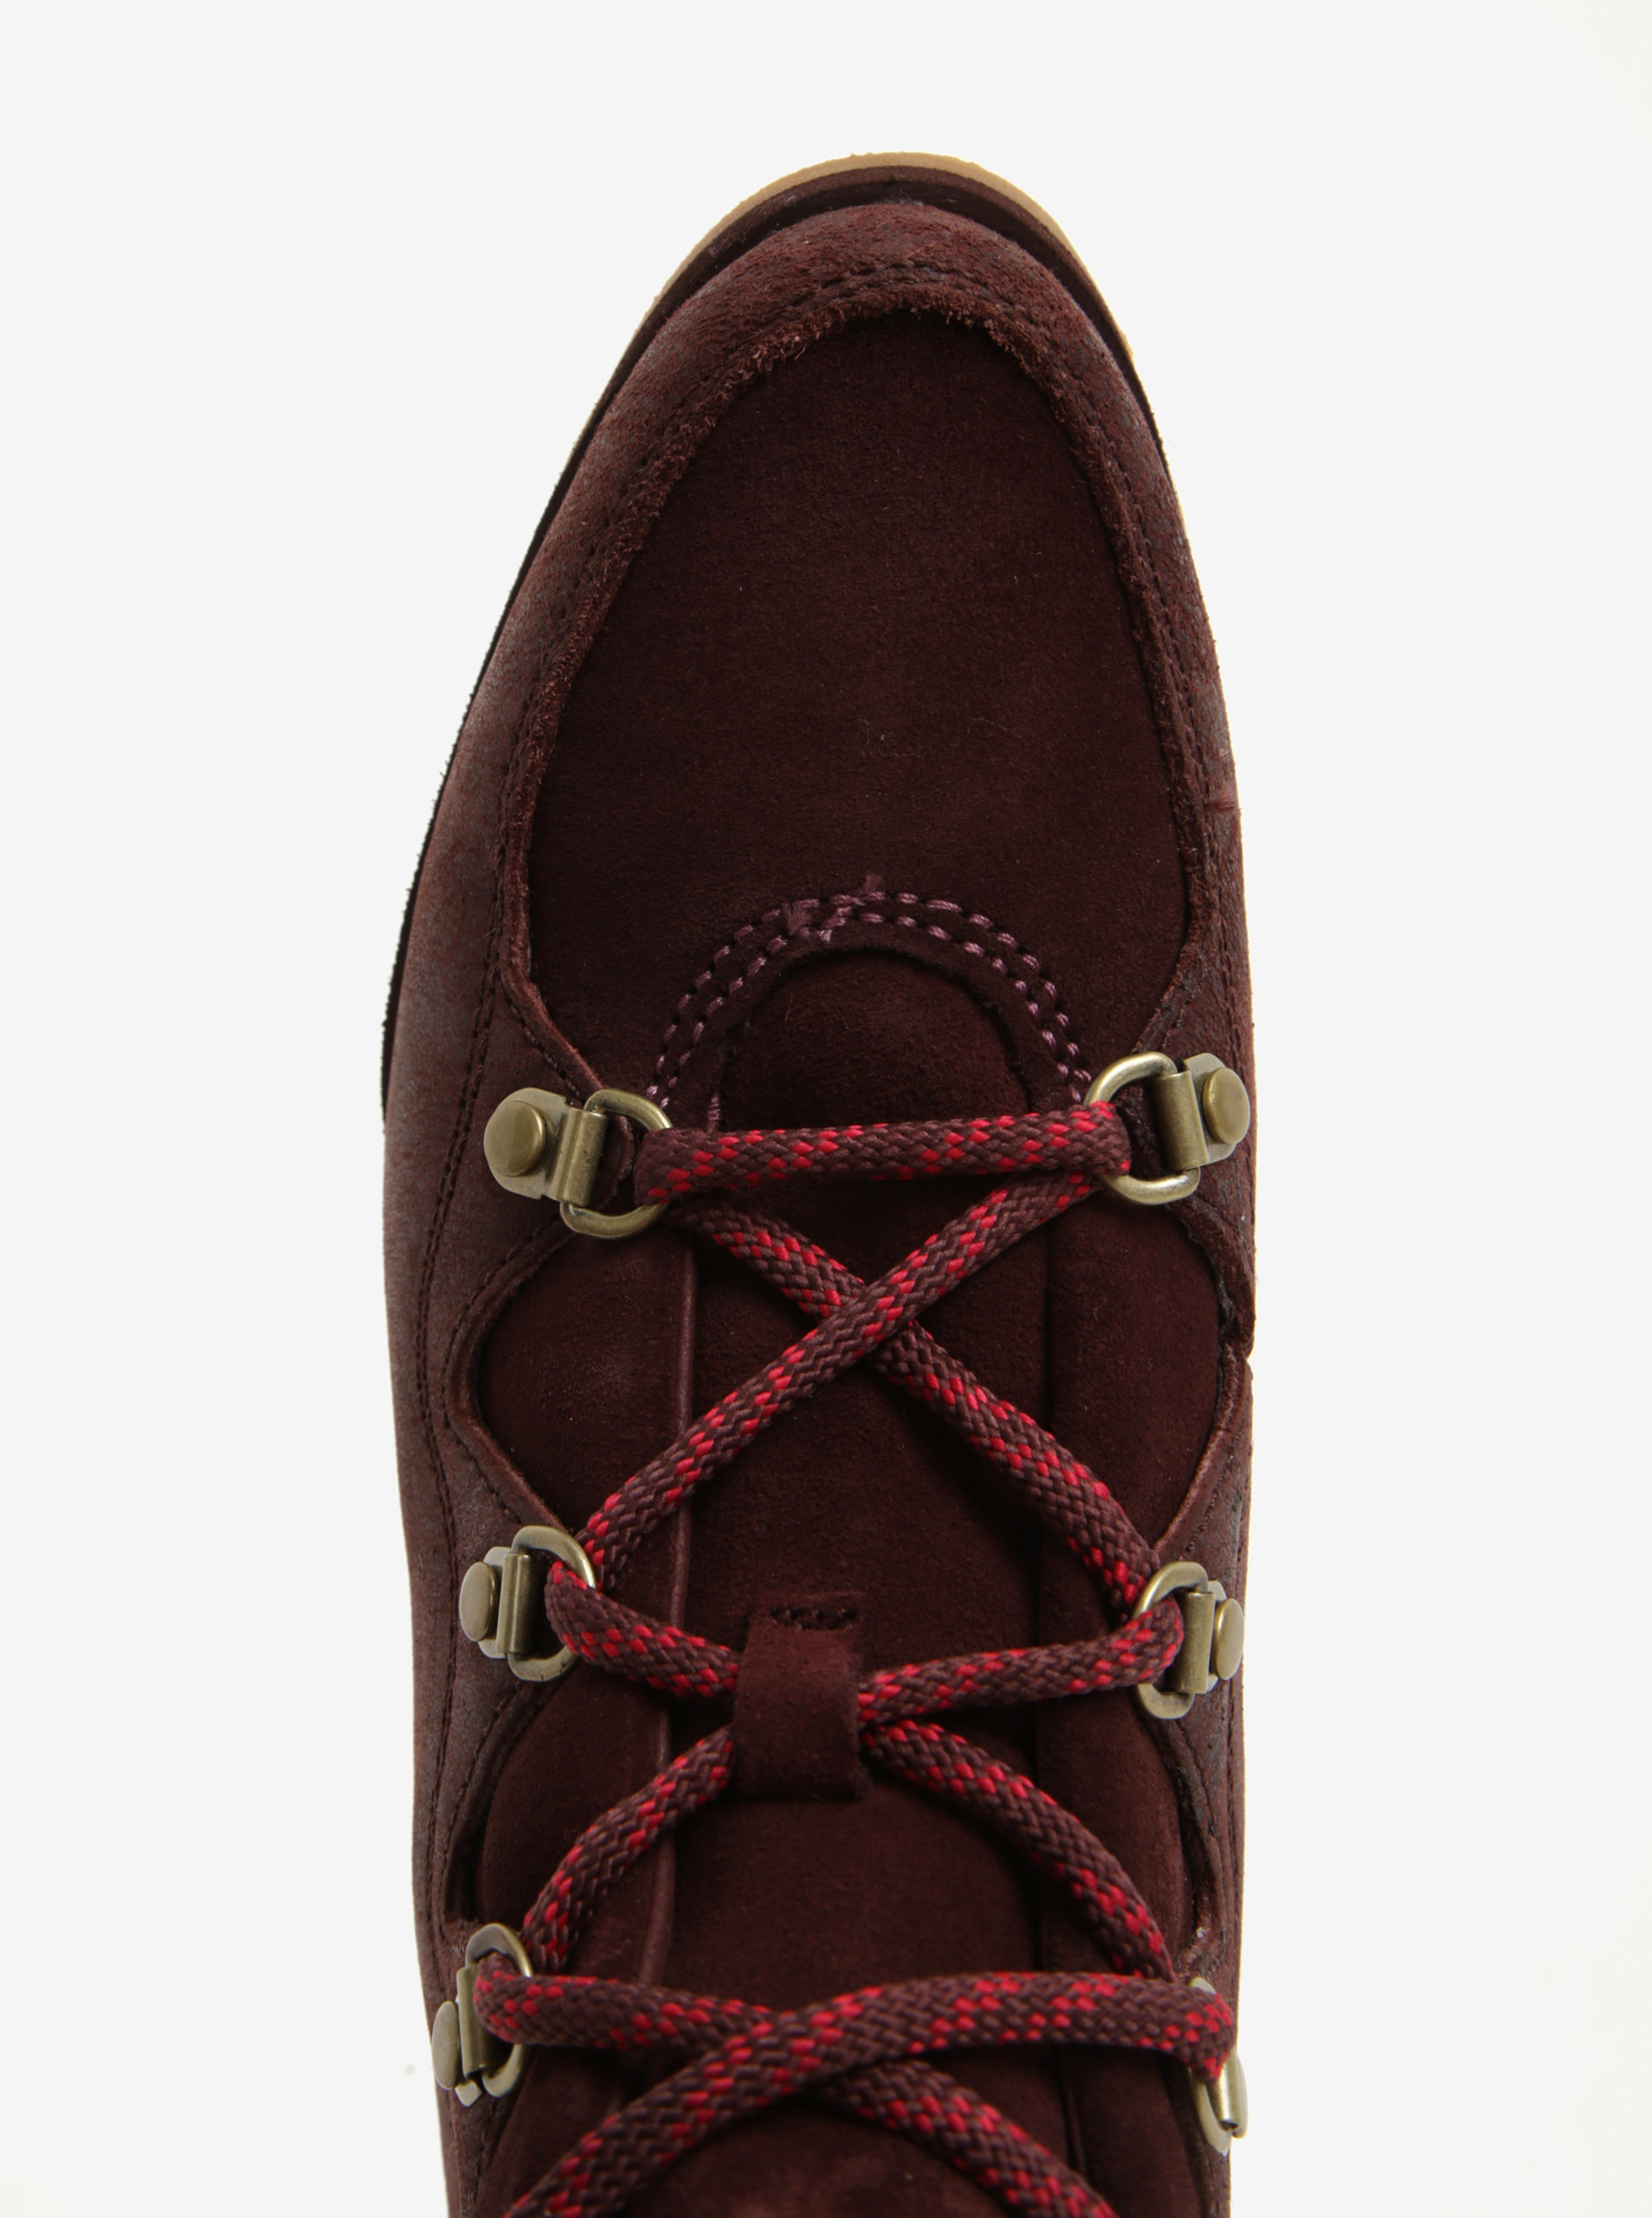 46b5c60c9b811 Vínové dámske členkové kožené vodovzdorné zimné topánky SOREL | ZOOT.sk